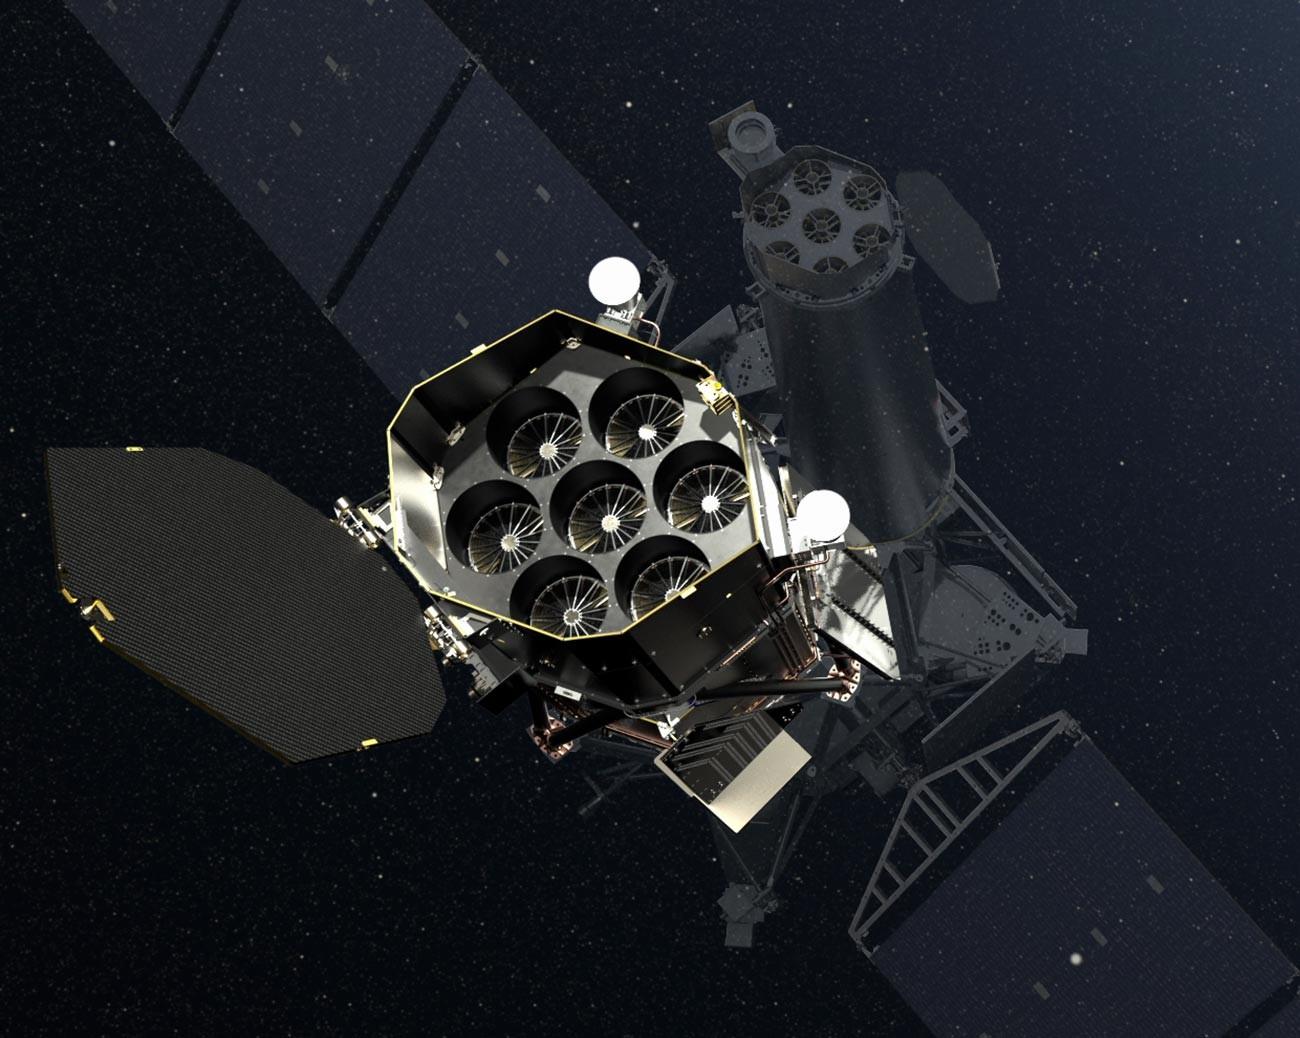 Spektr-RG space observatory